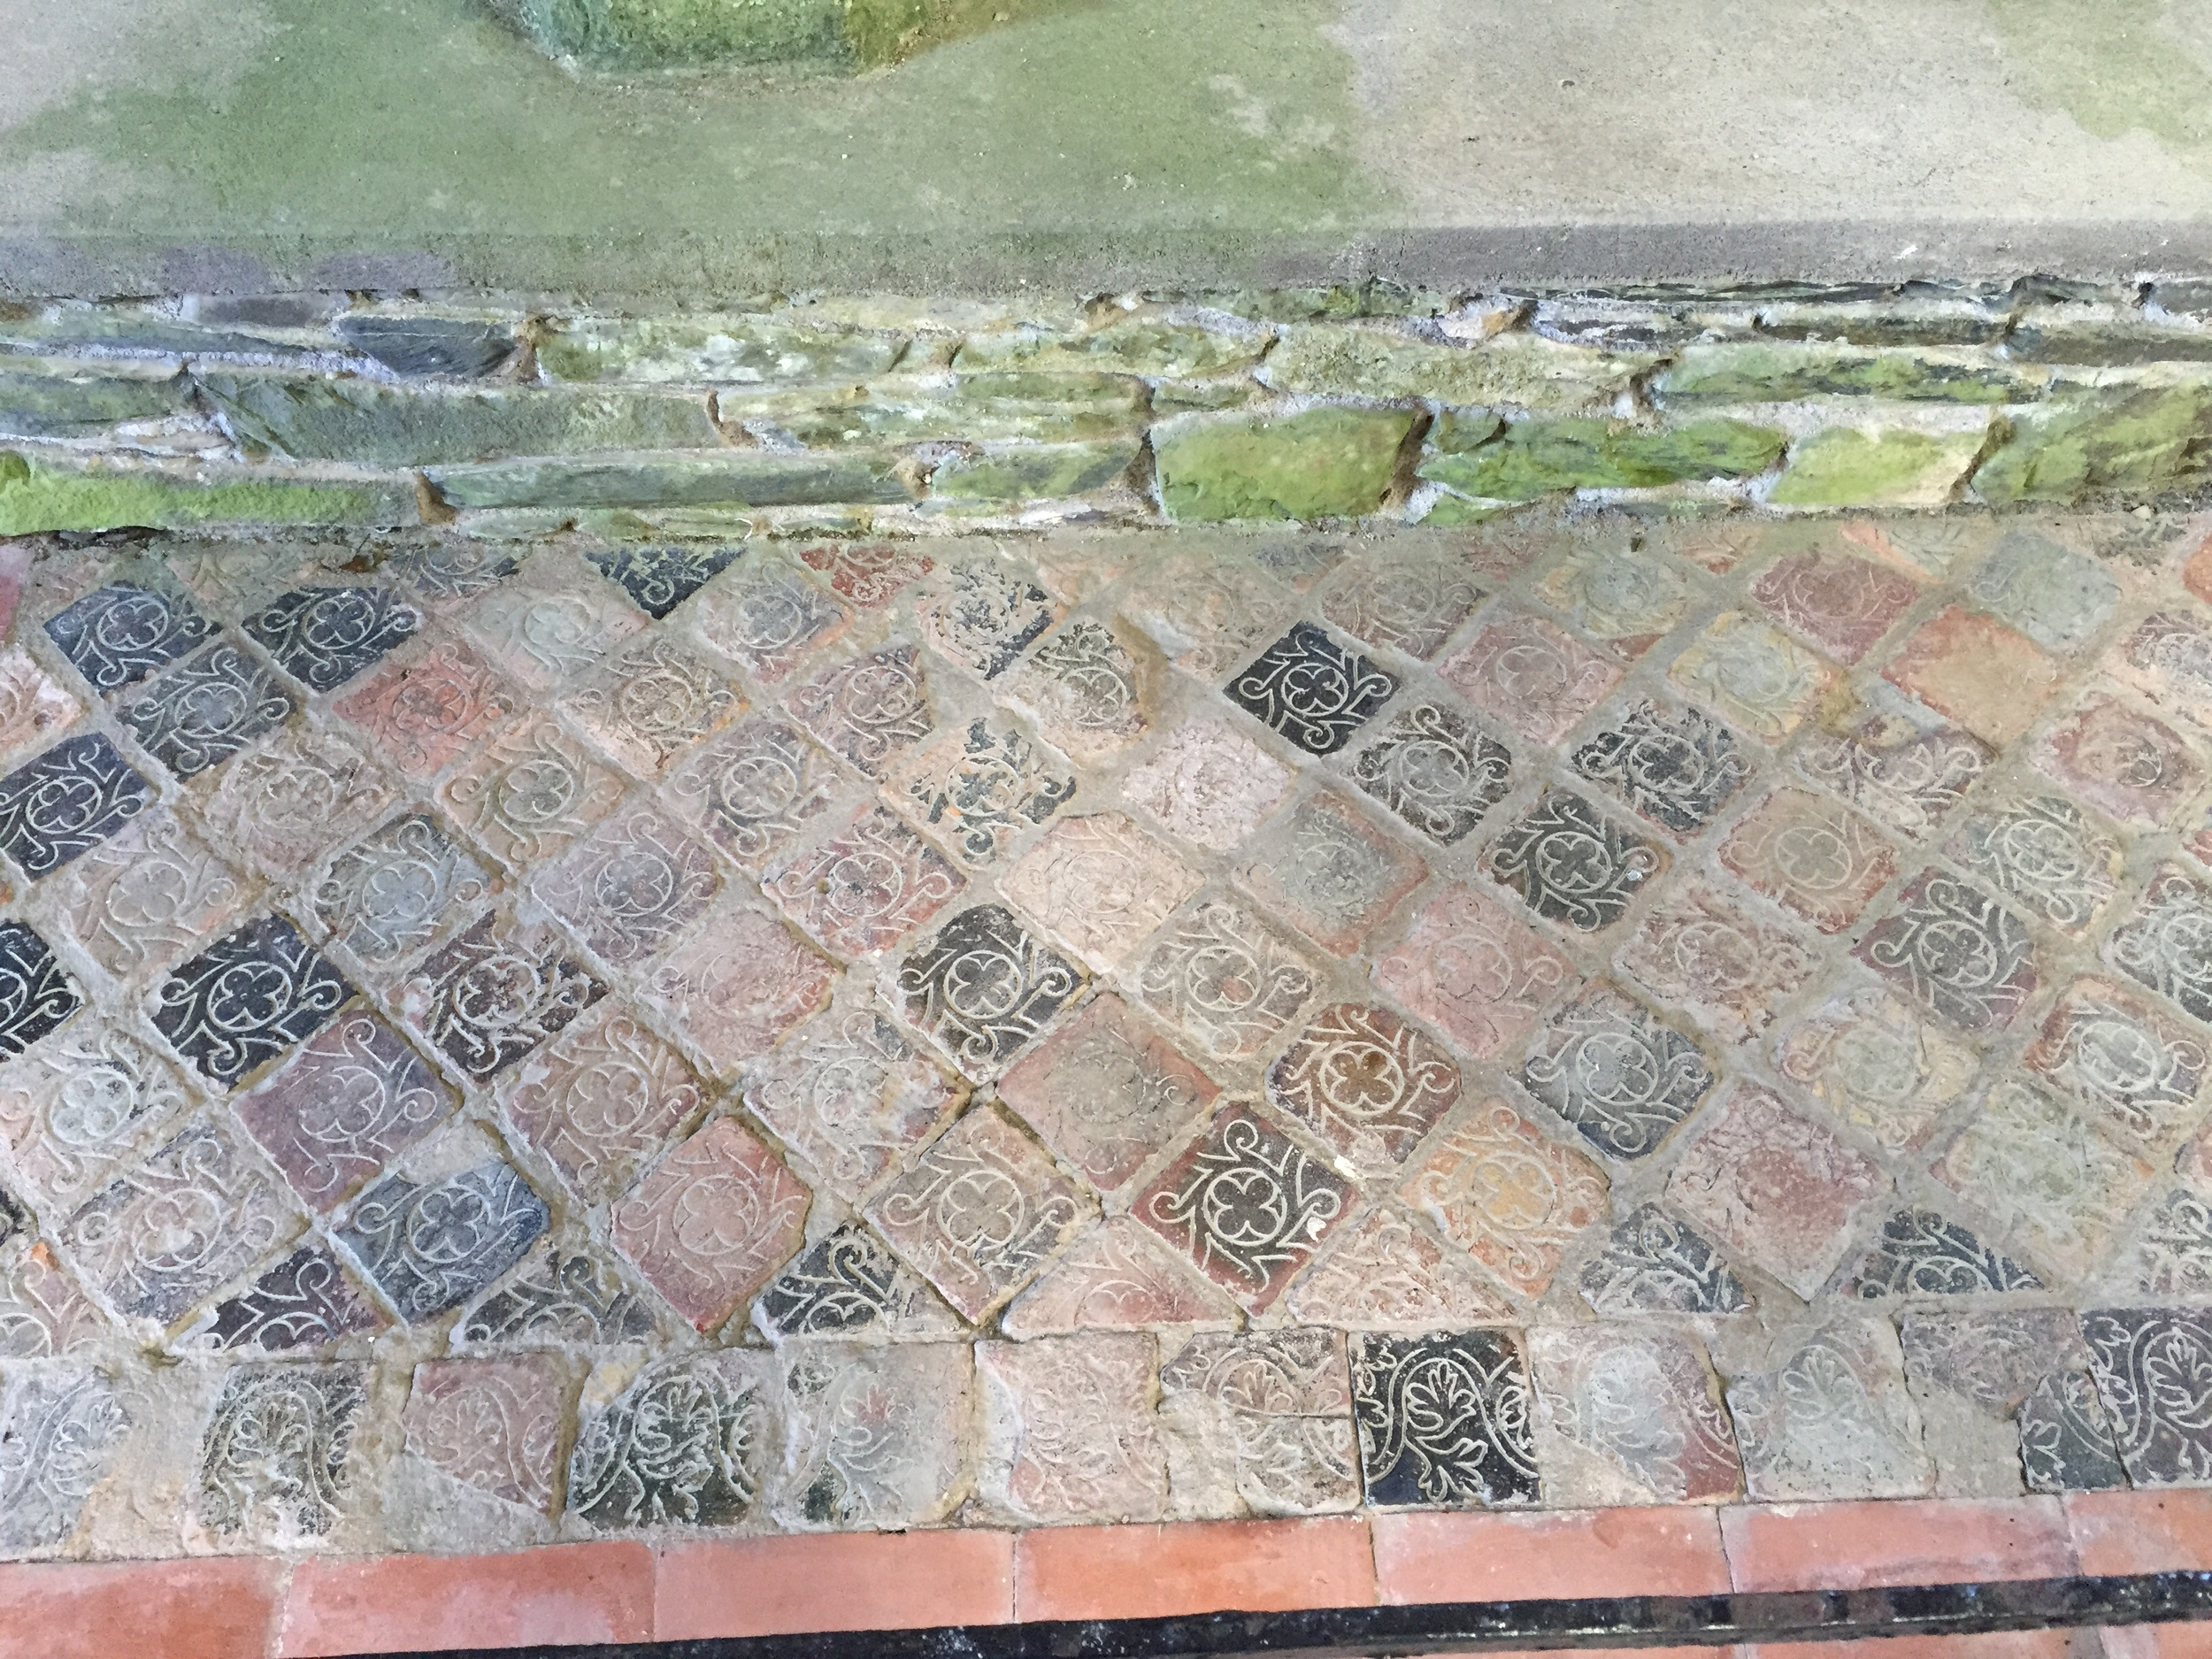 Tiled floors...beautiful!